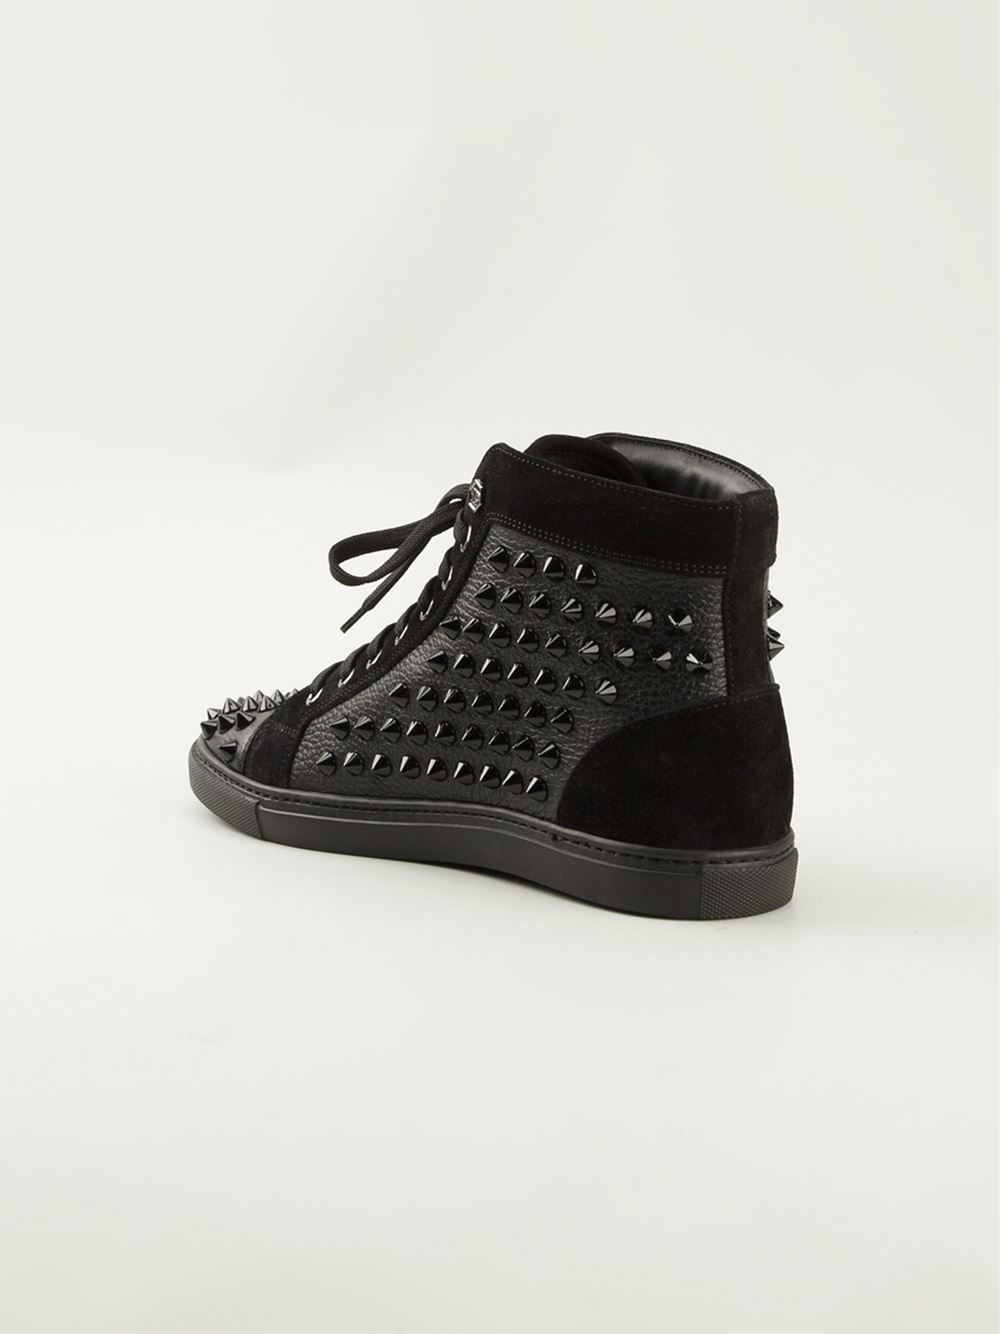 Philipp Plein Studded Hitop Sneakers In Black Lyst